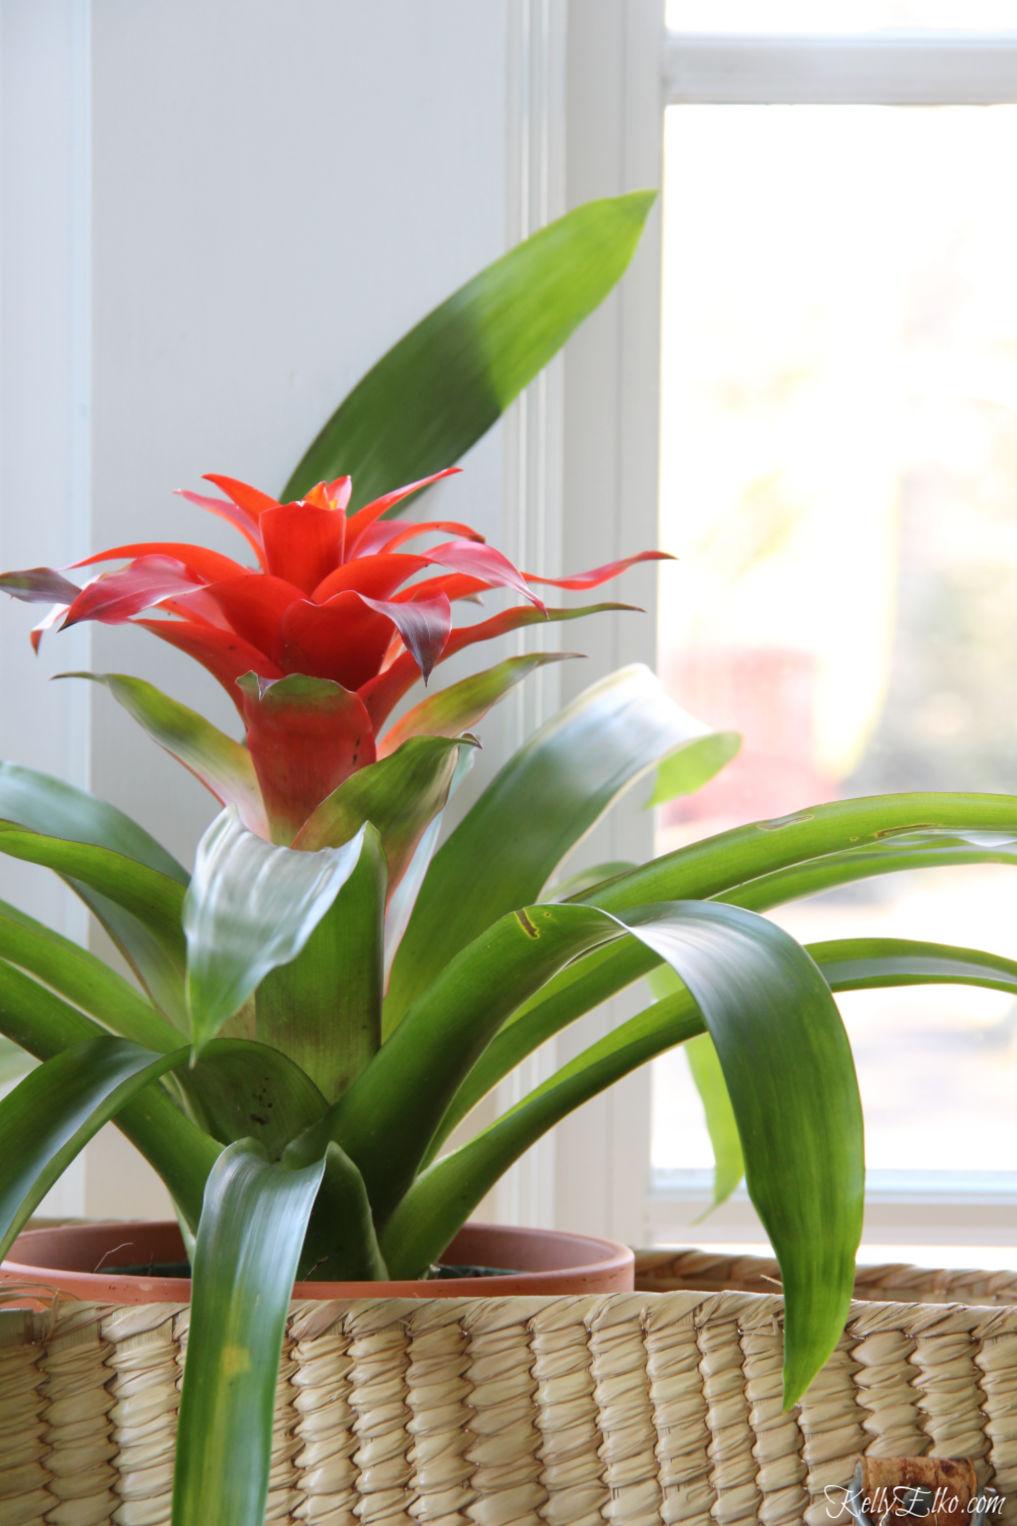 Bromeliads are such a beautiful plant kellyelko.com #bromeliad #plants #houseplants #planter #jungalow